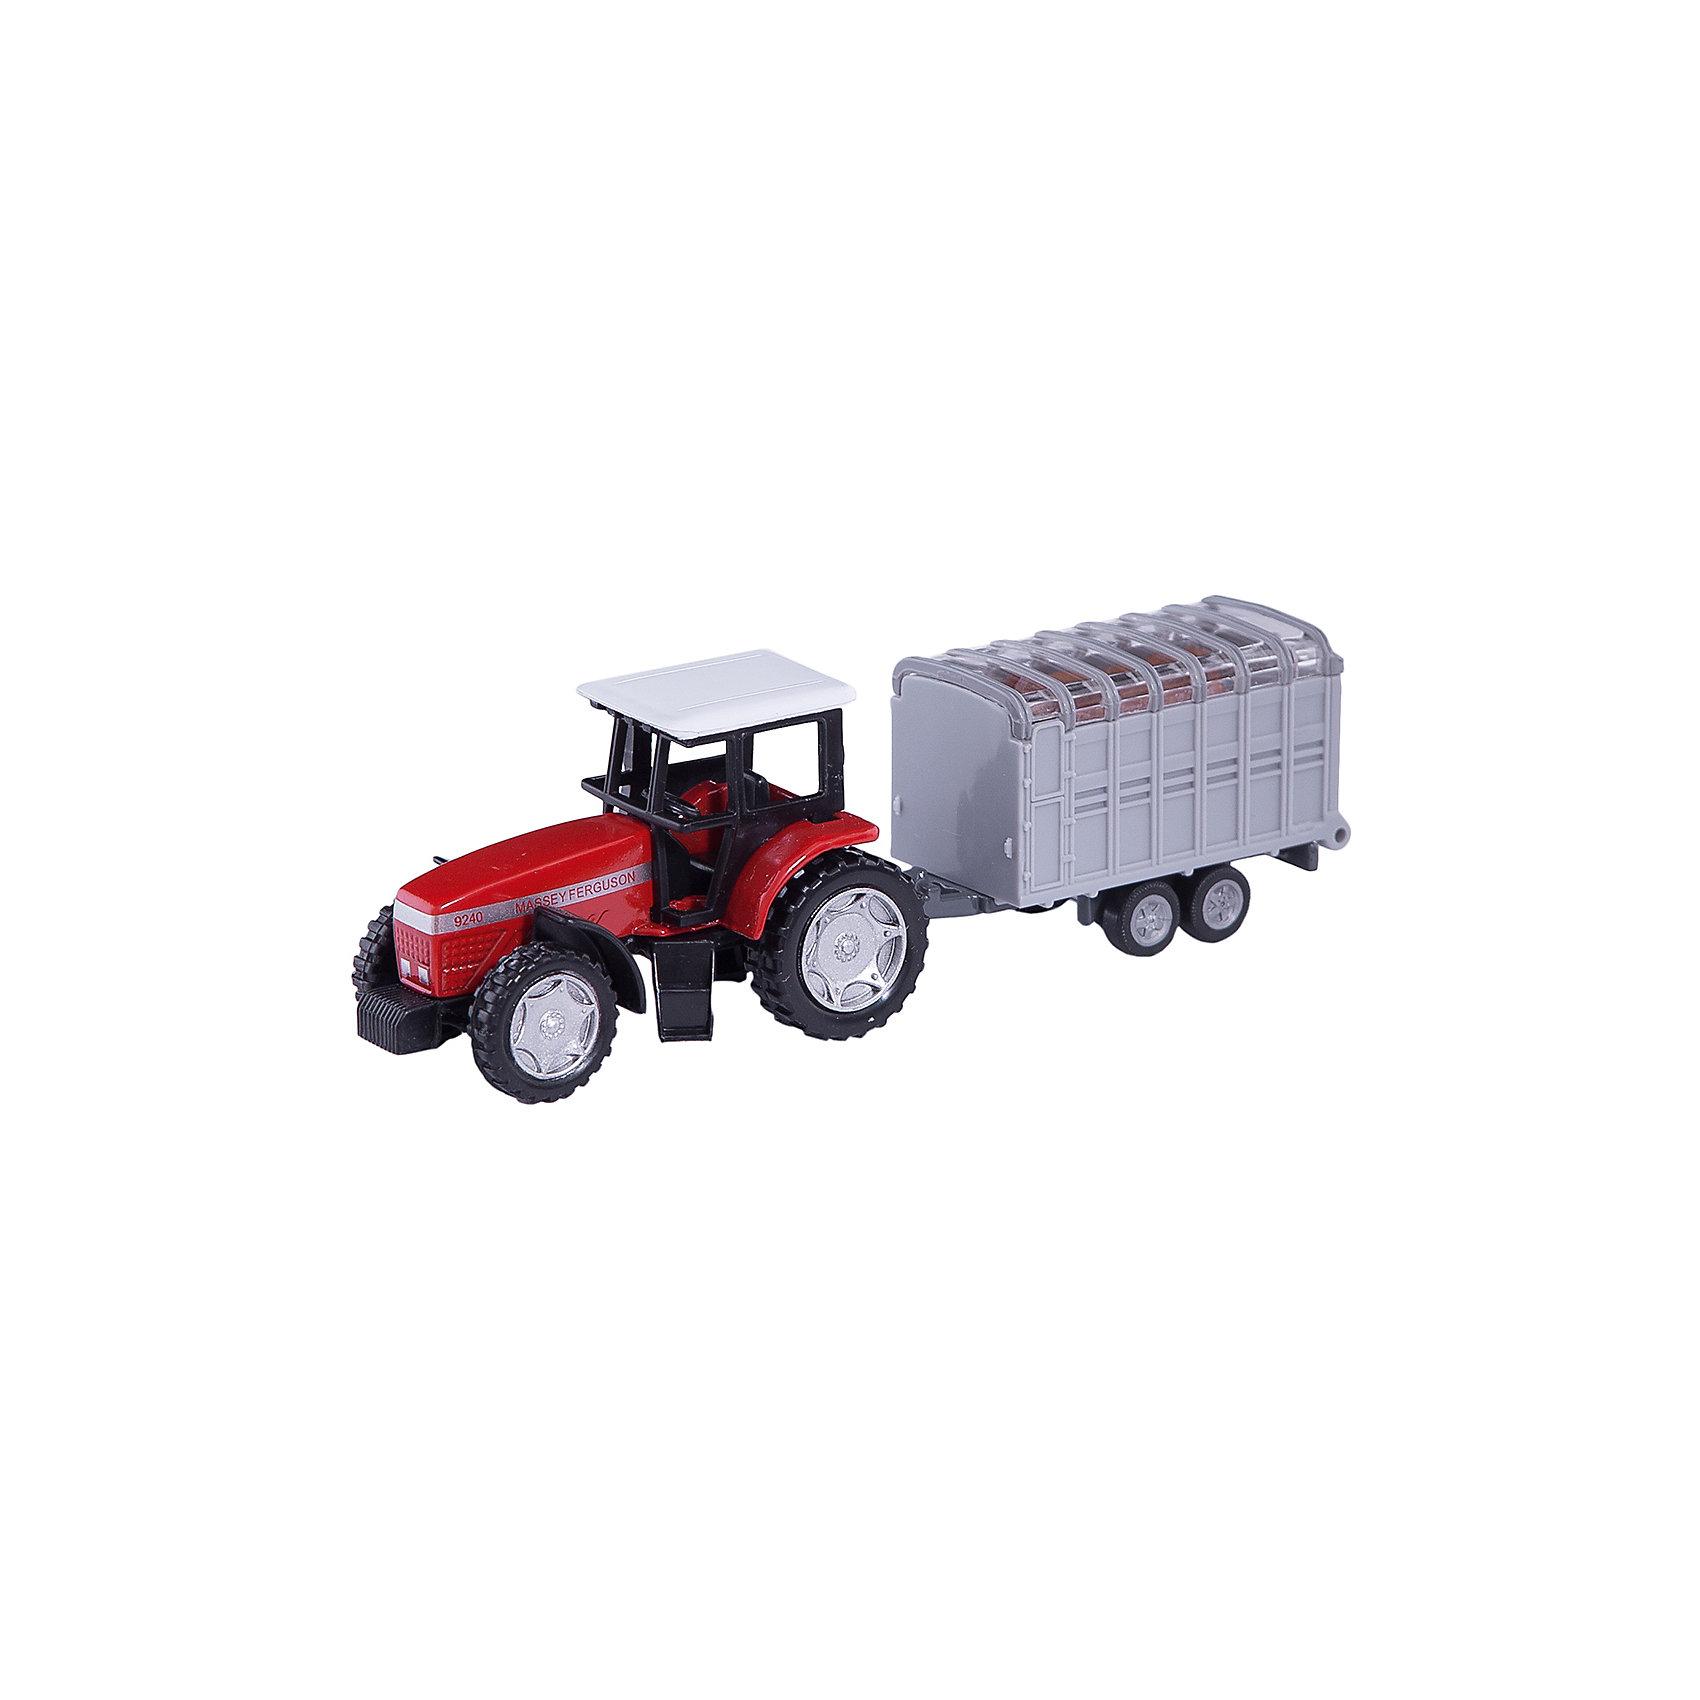 SIKU SIKU 1640 Трактор с прицепом для скота siku трактор с прицепом для бревен